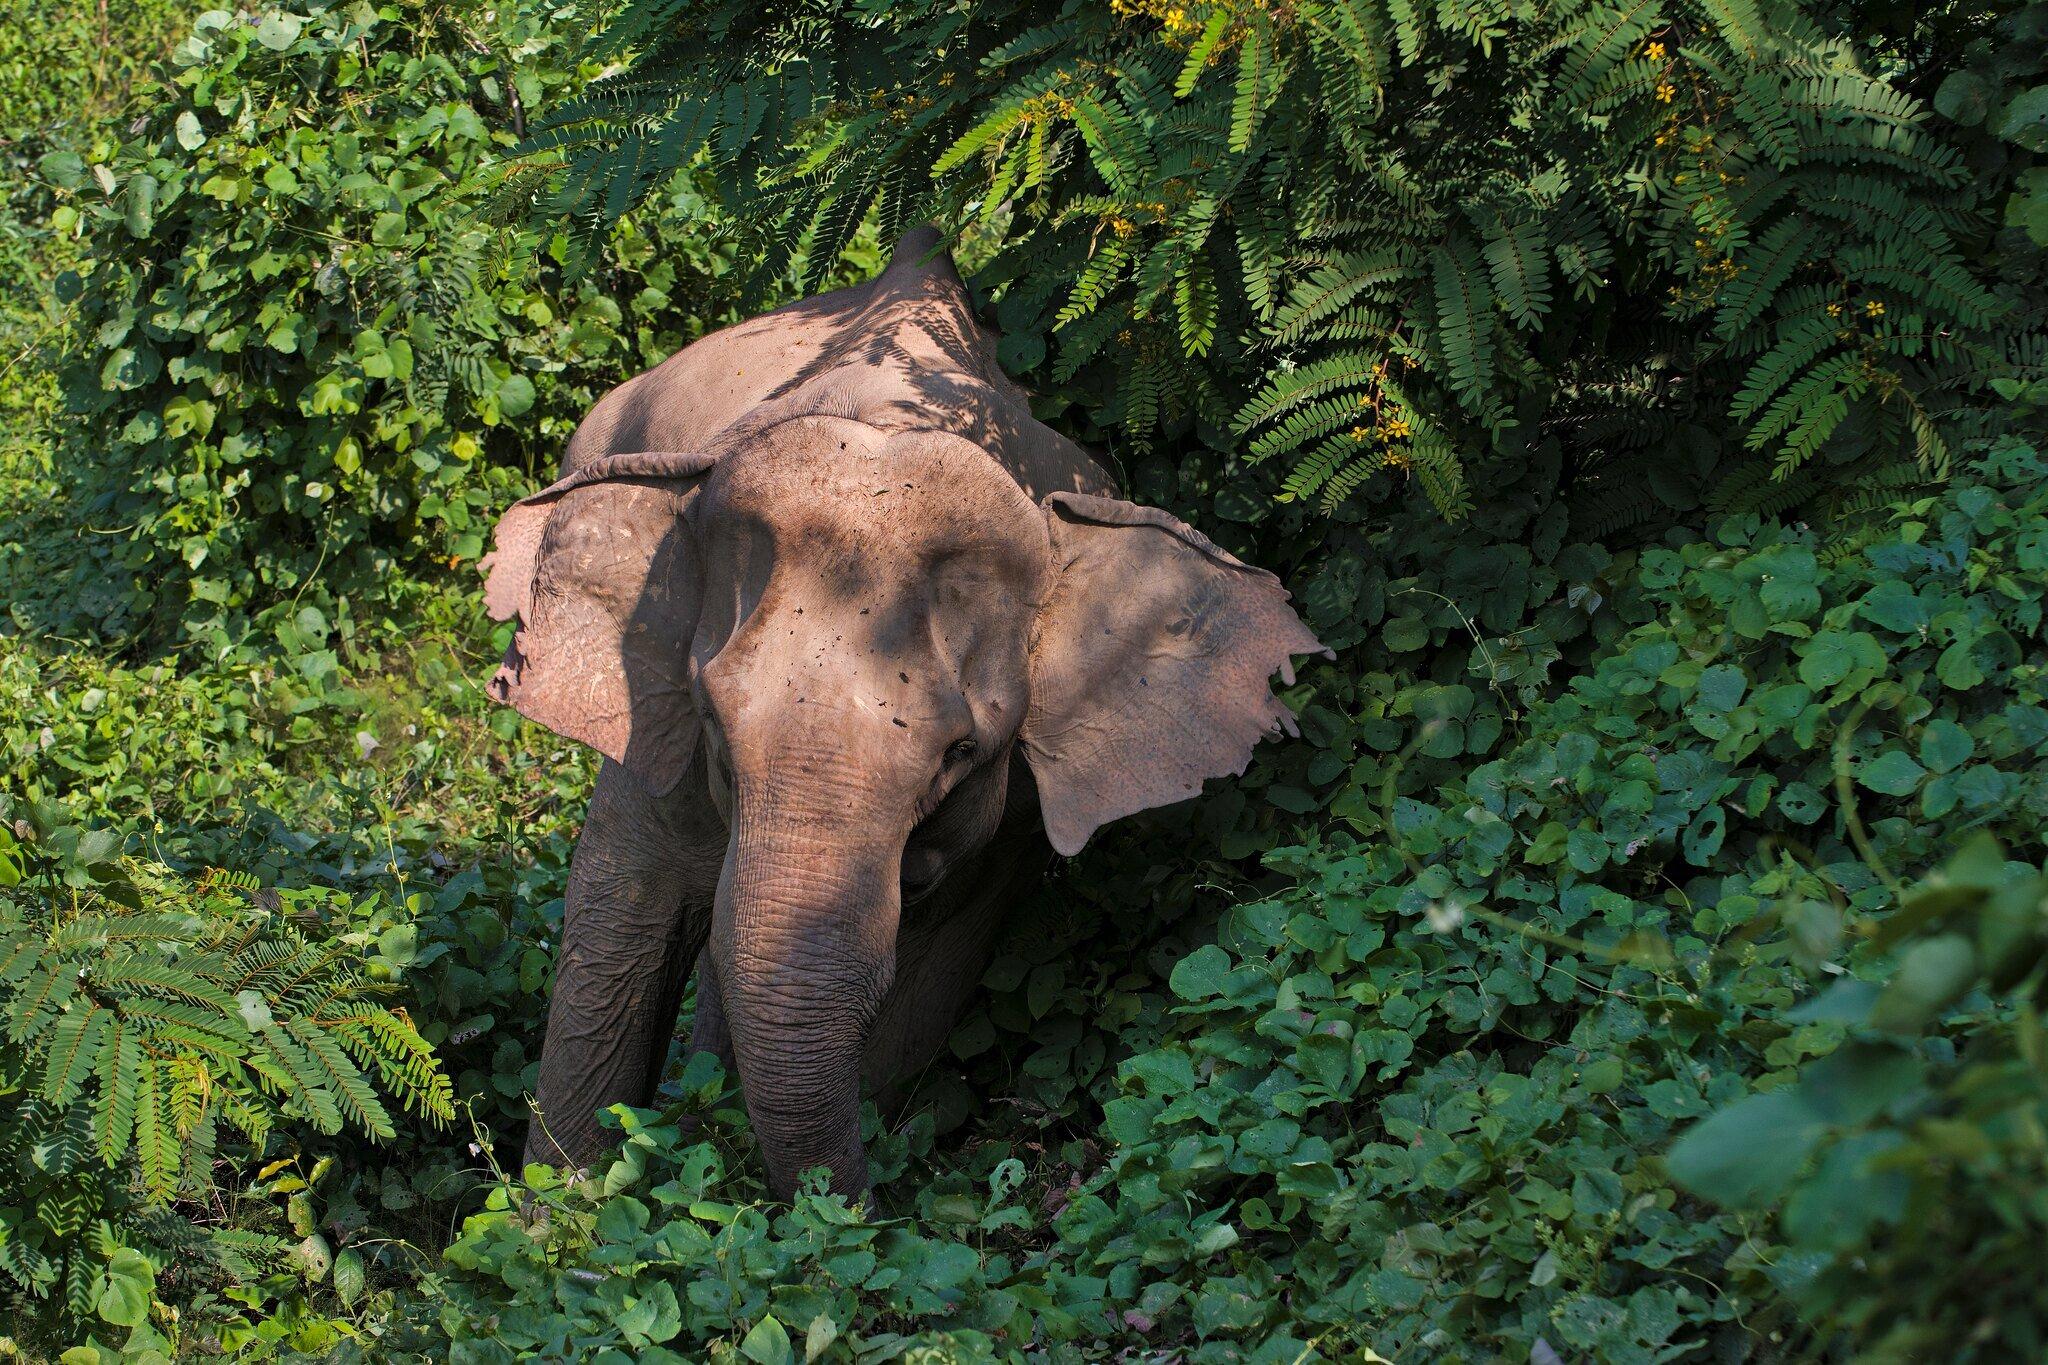 Elephant in jungle in Laos